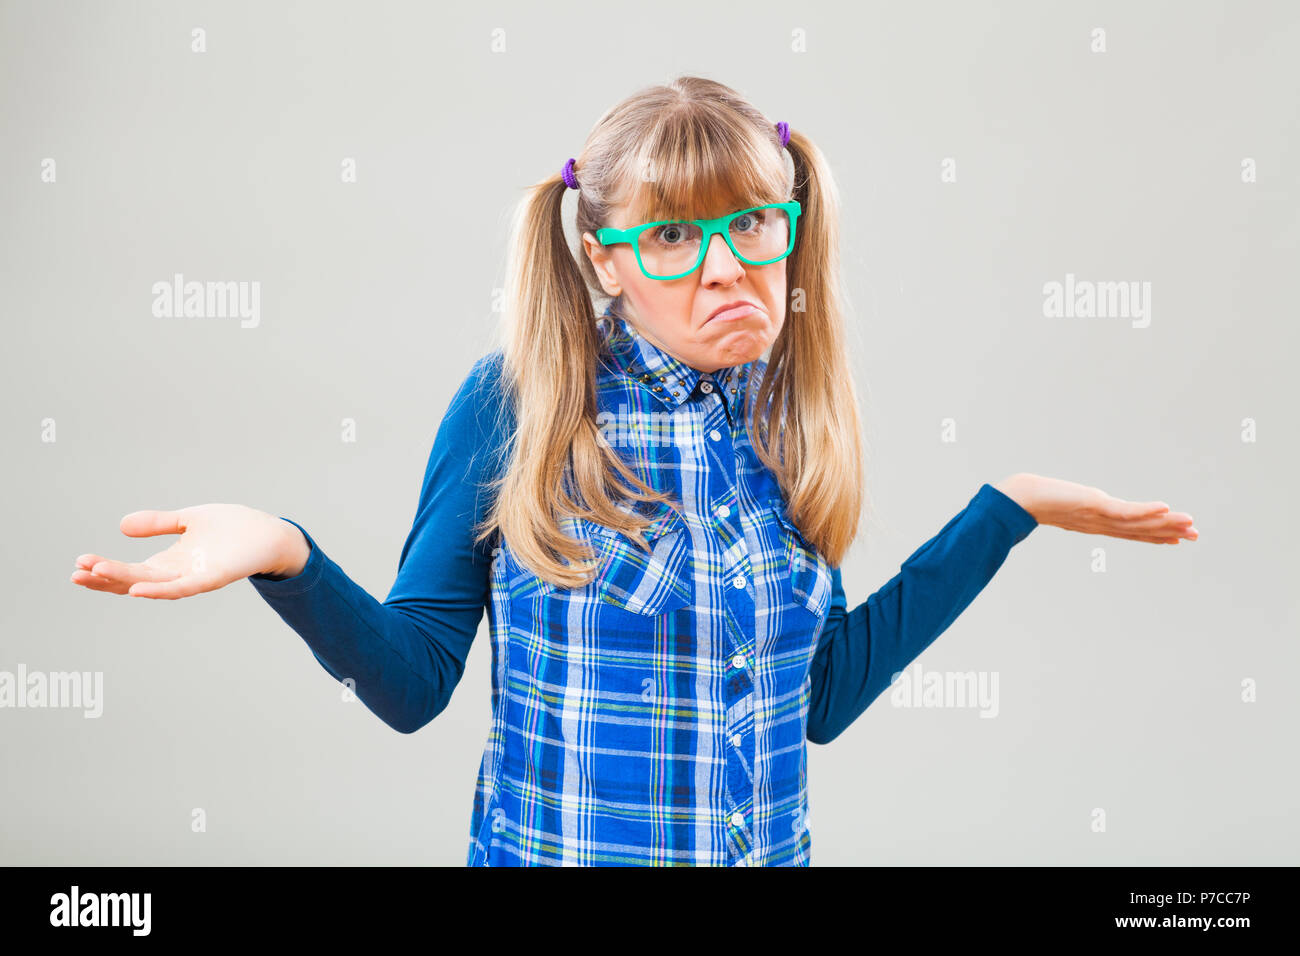 Studio shot portrait of confused nerdy woman - Stock Image